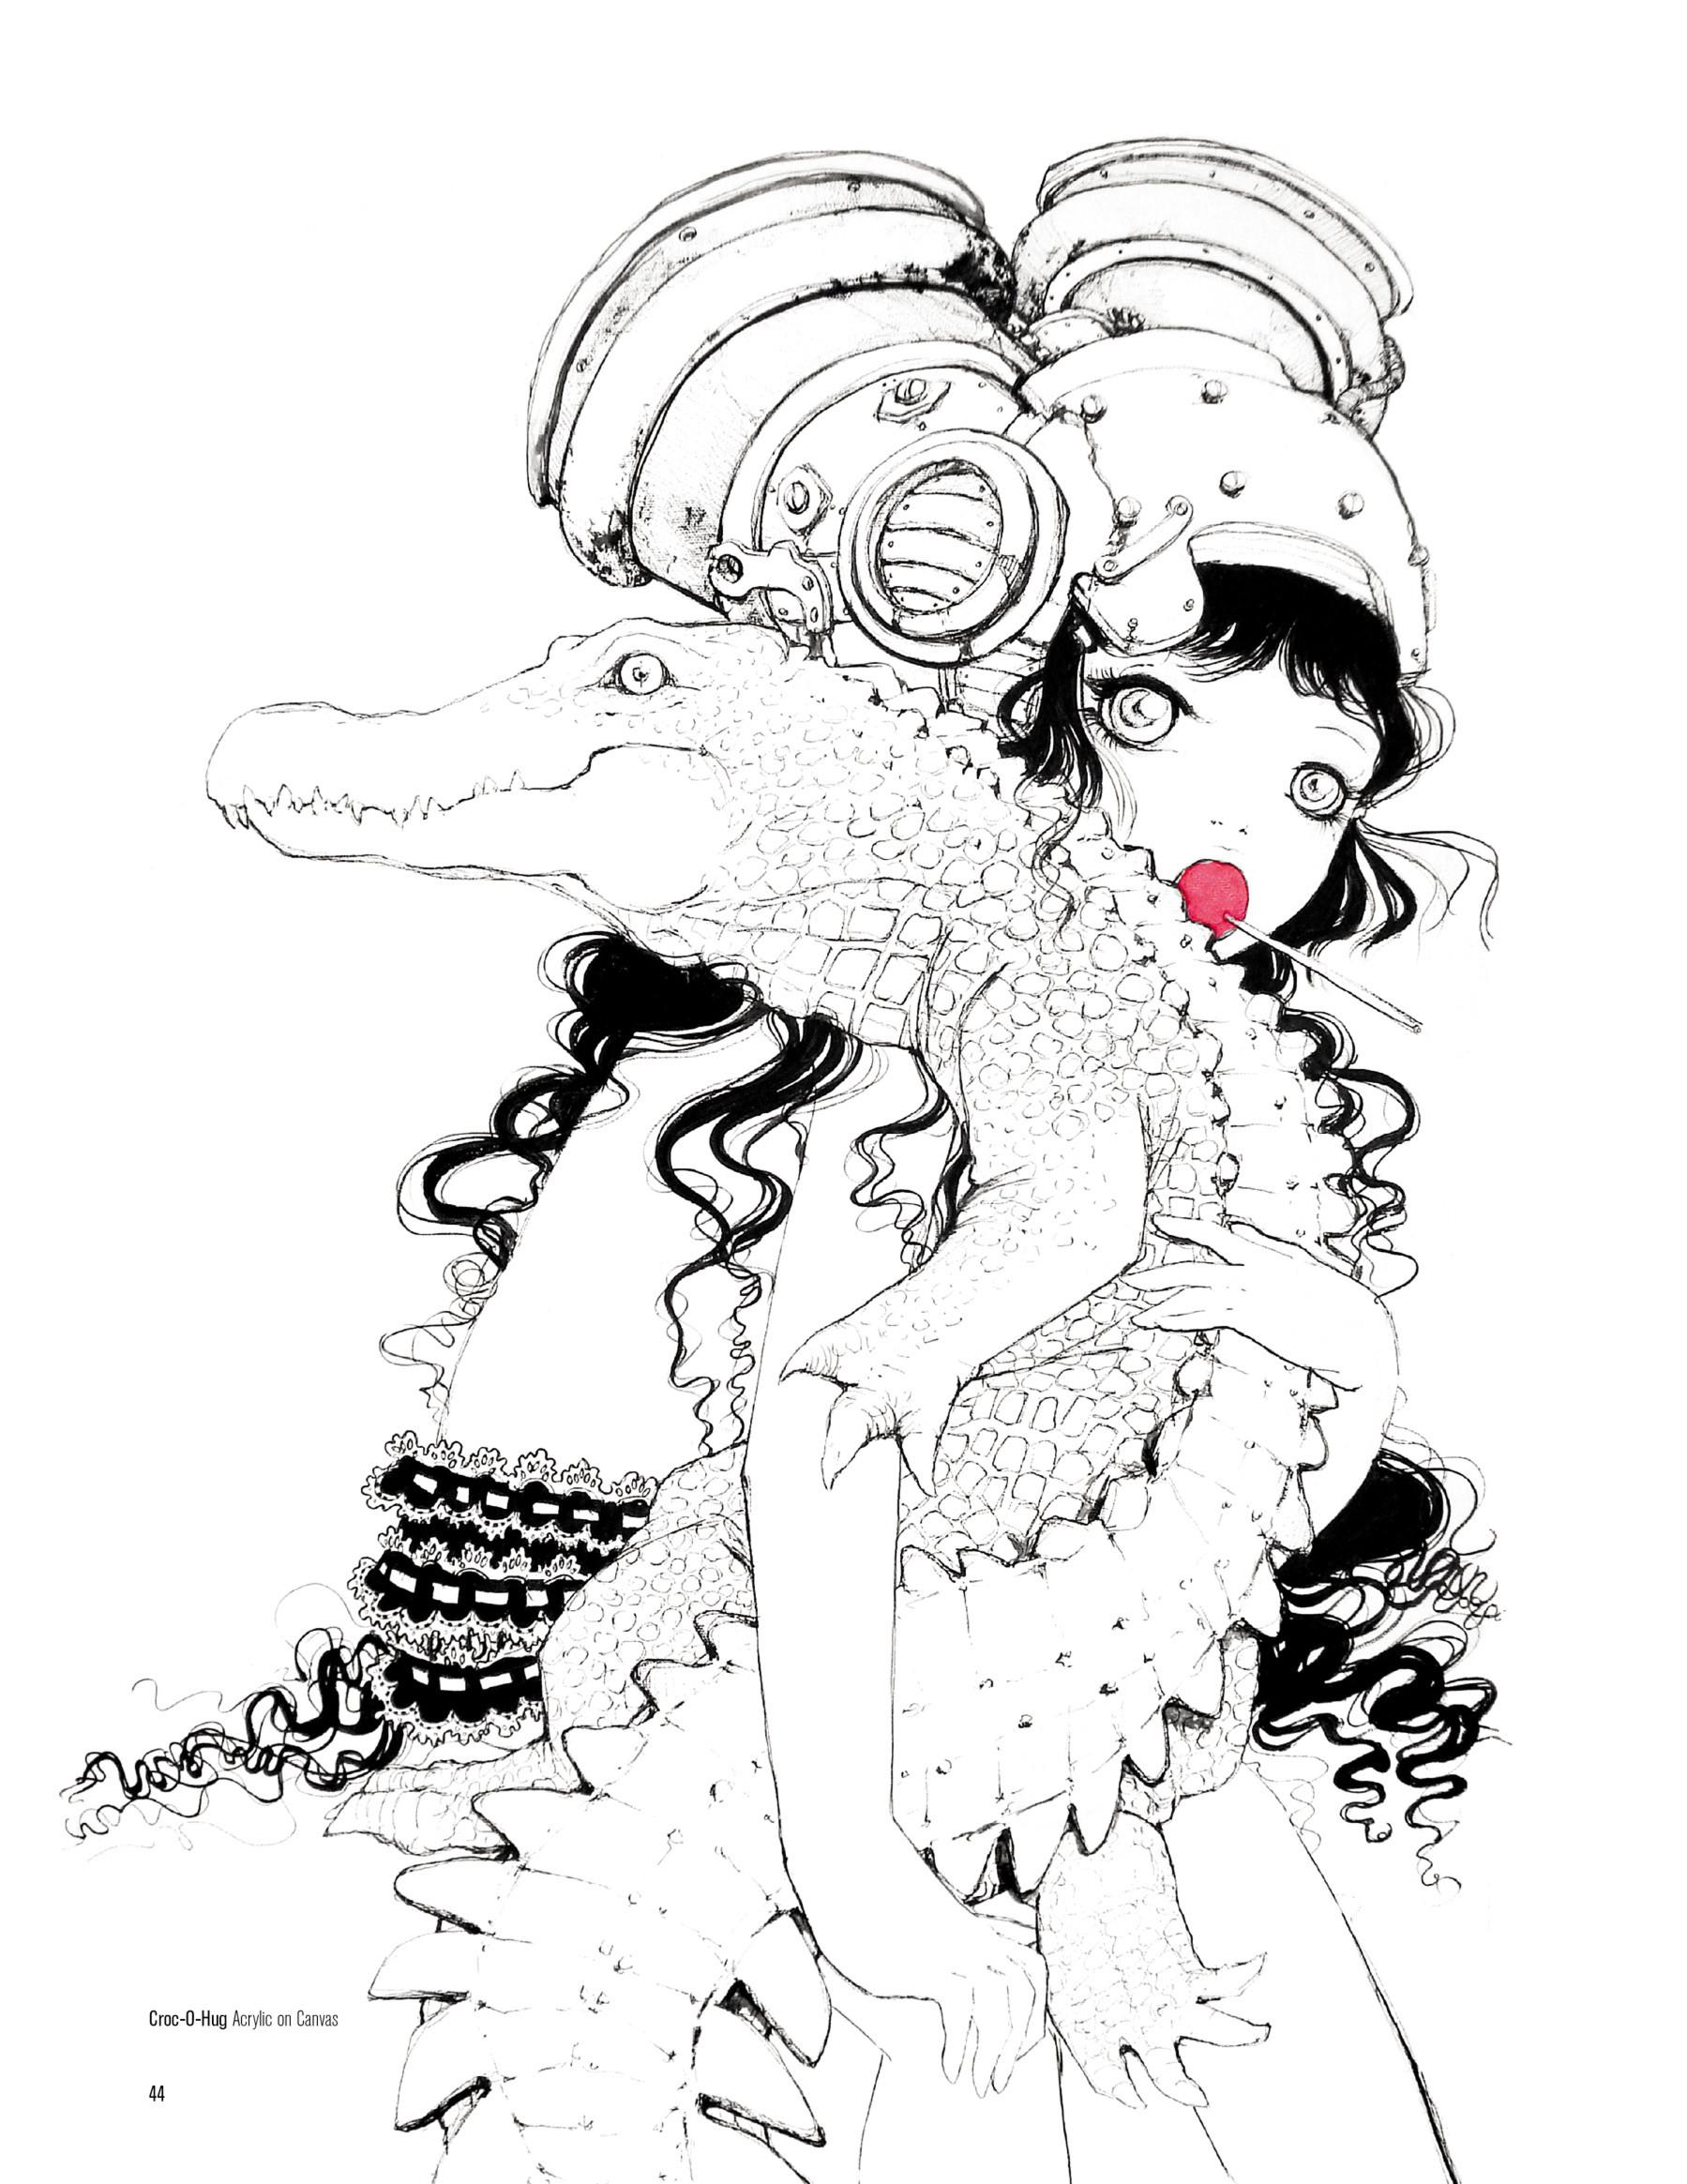 Helmetgirls - The Art of Camilla d'Errico-041